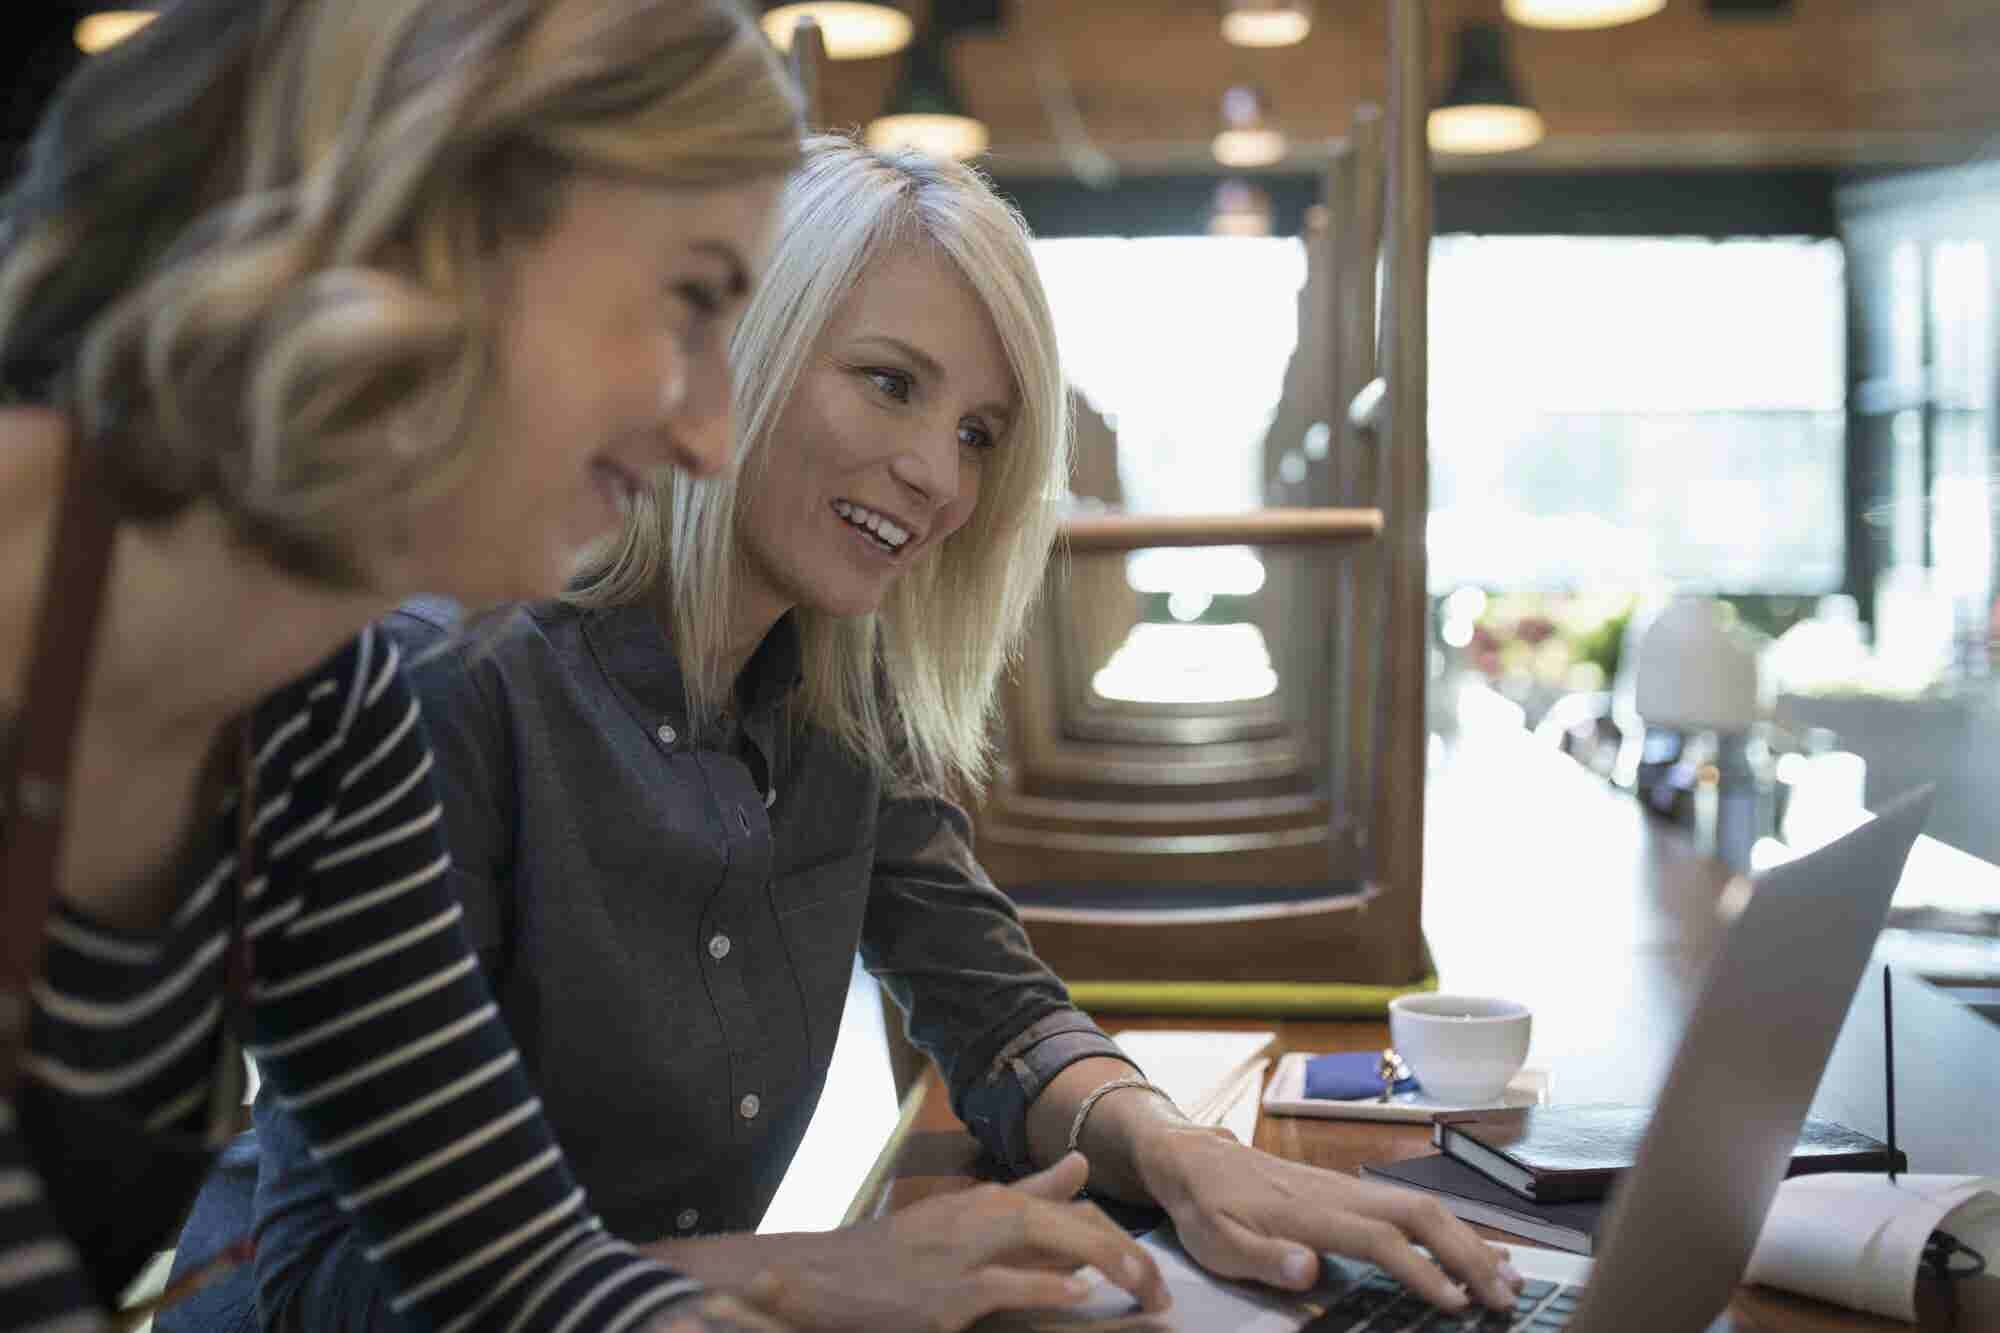 Women Job Seekers Should Target Small Employers That Can Better Offer Work Flexibility